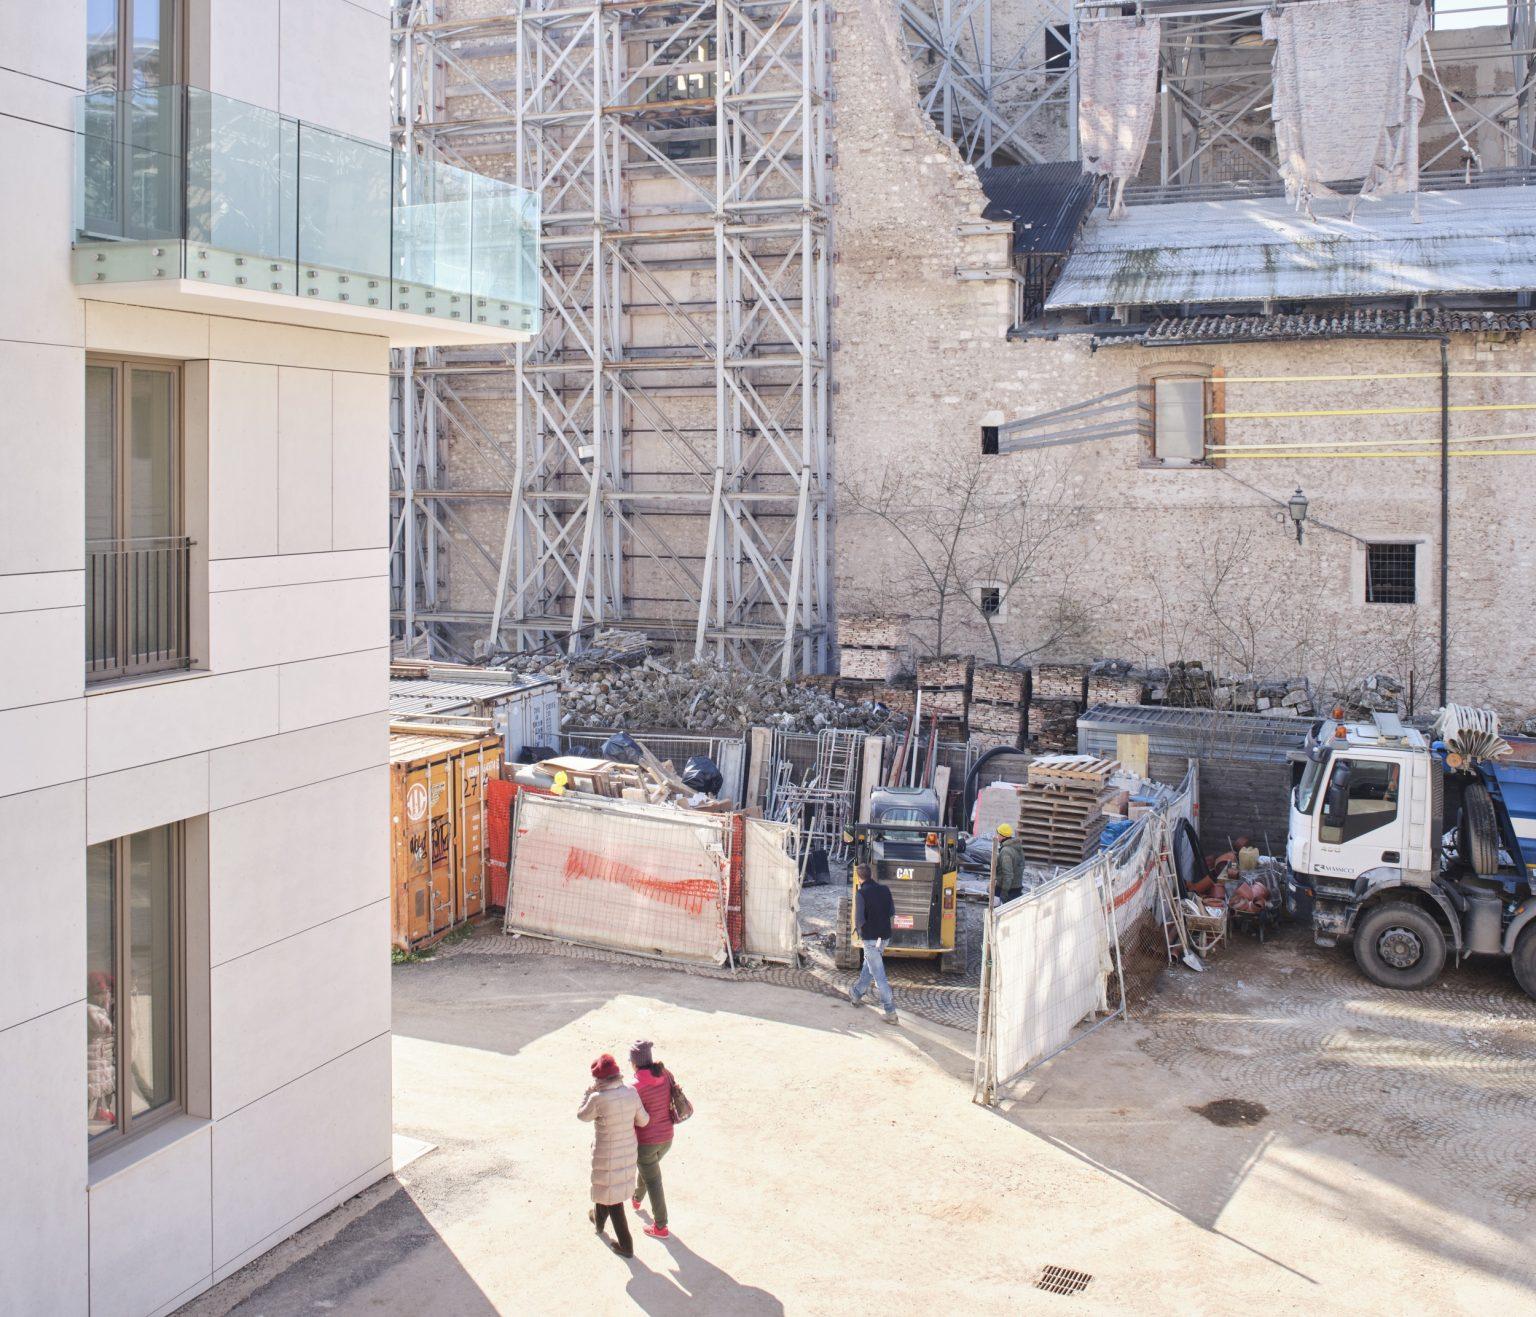 Piazza Santa Maria Paganica: new reinforced concrete building and Church of Santa Maria Paganica, uninhabitable since April 2009. L'Aquila, historic center, Italy, 2019